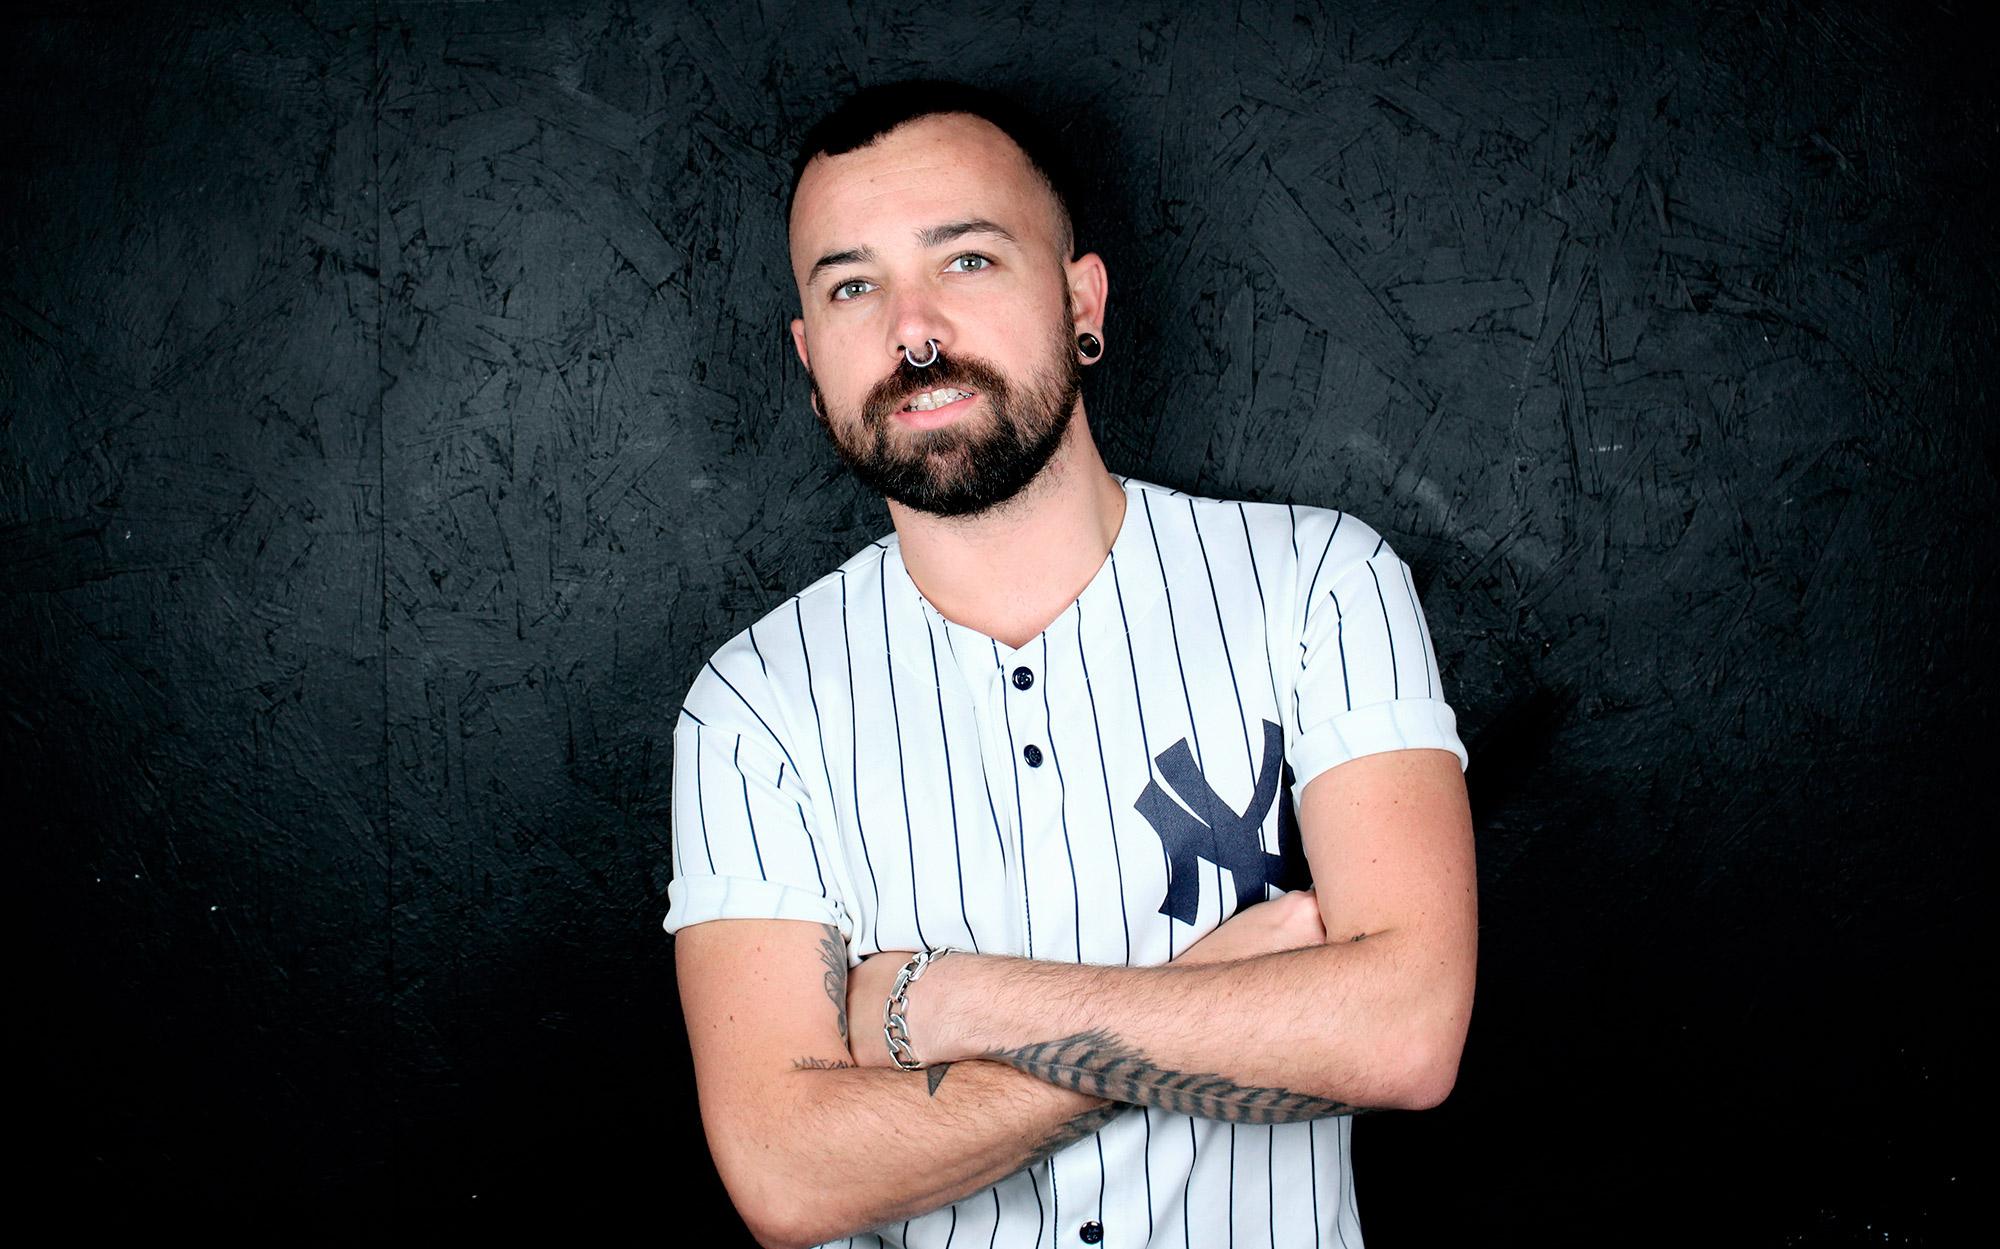 Eloy Gonzalo, 28